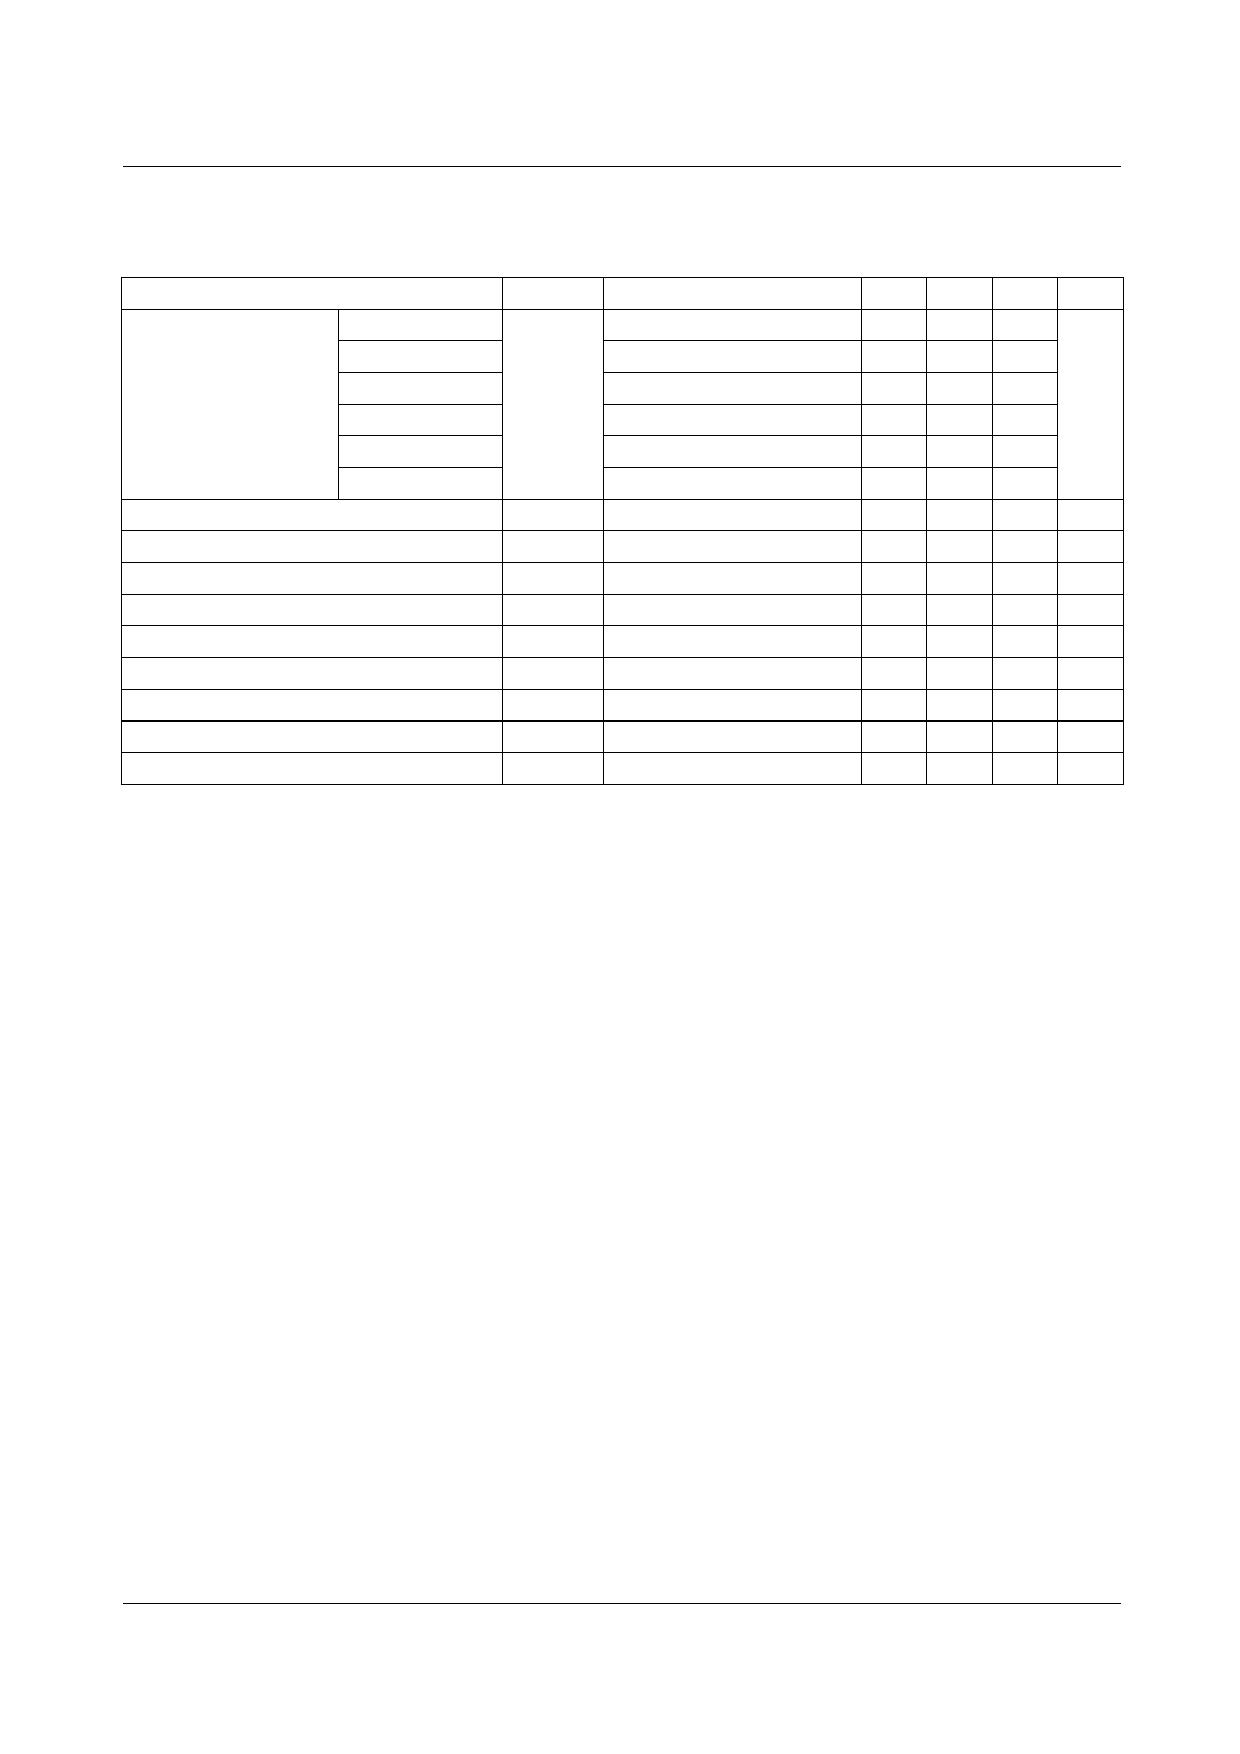 KA78R33CTU pdf, ピン配列